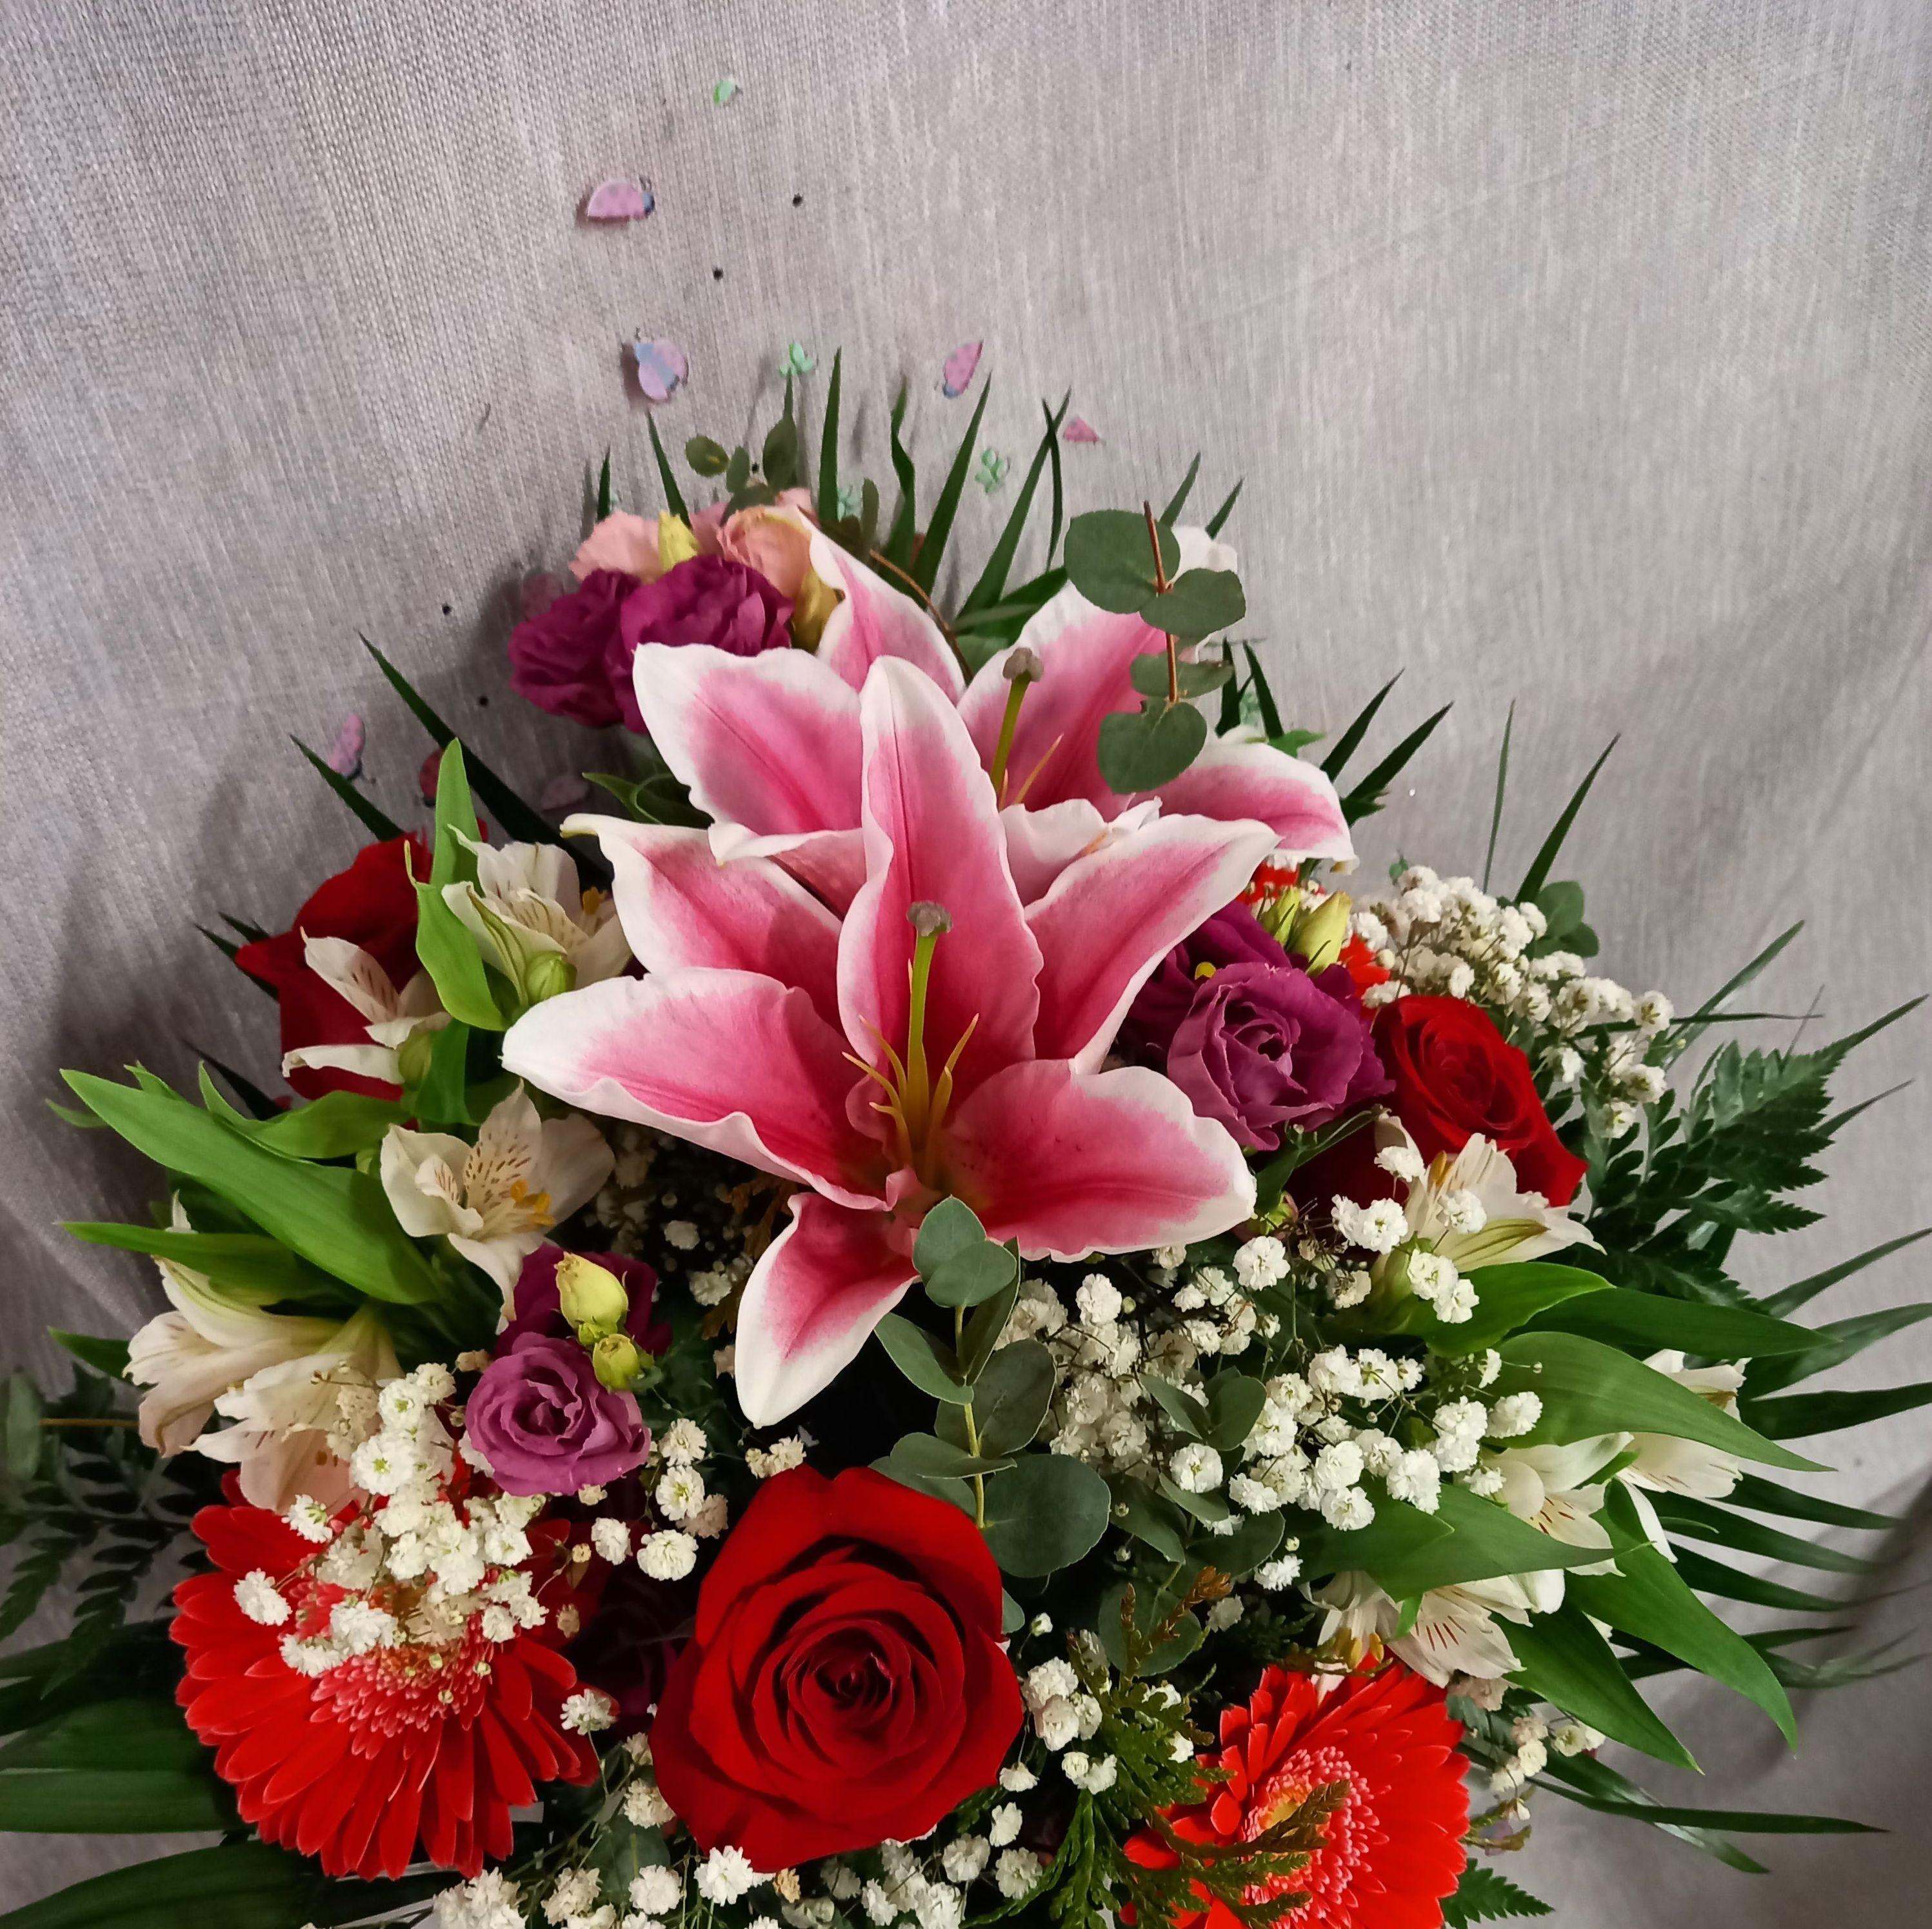 ramo variado lilium, gerberas, rosas rojas, astromelia lisiantums